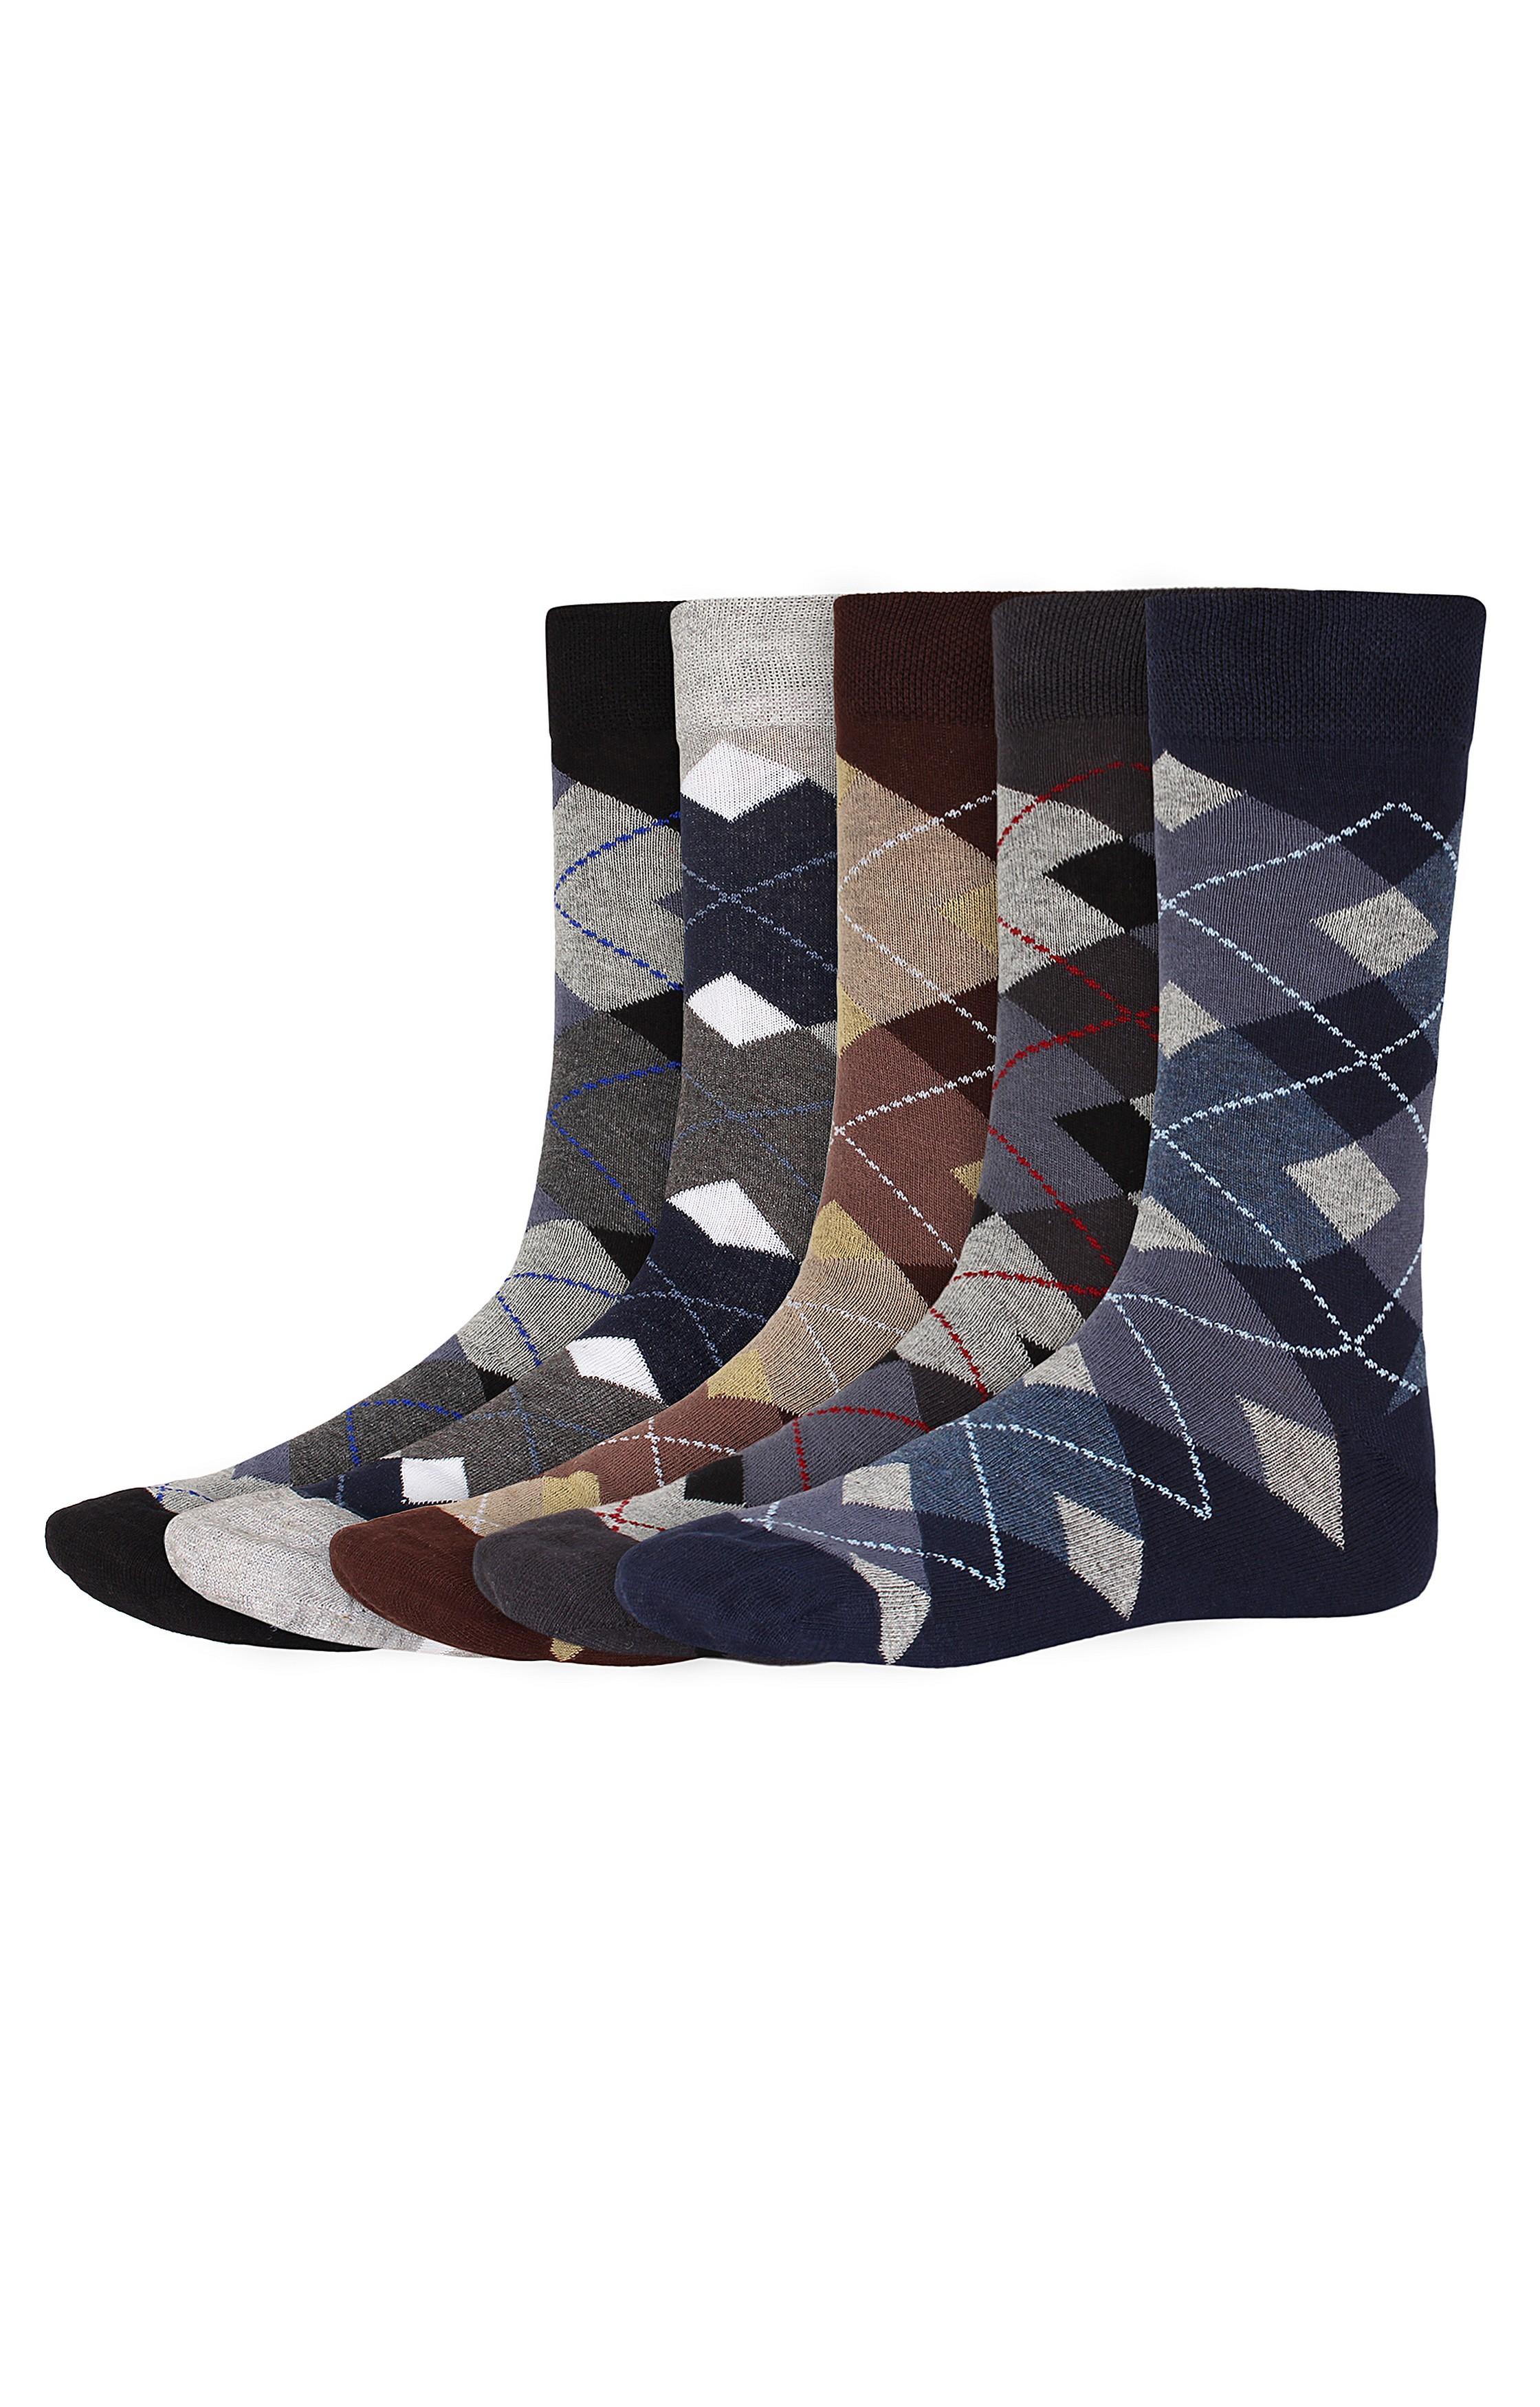 SIDEWOK | SIDEWOK Calf Length Patterned Multicolour Cotton Socks for Men (Pack of 5 Pairs)